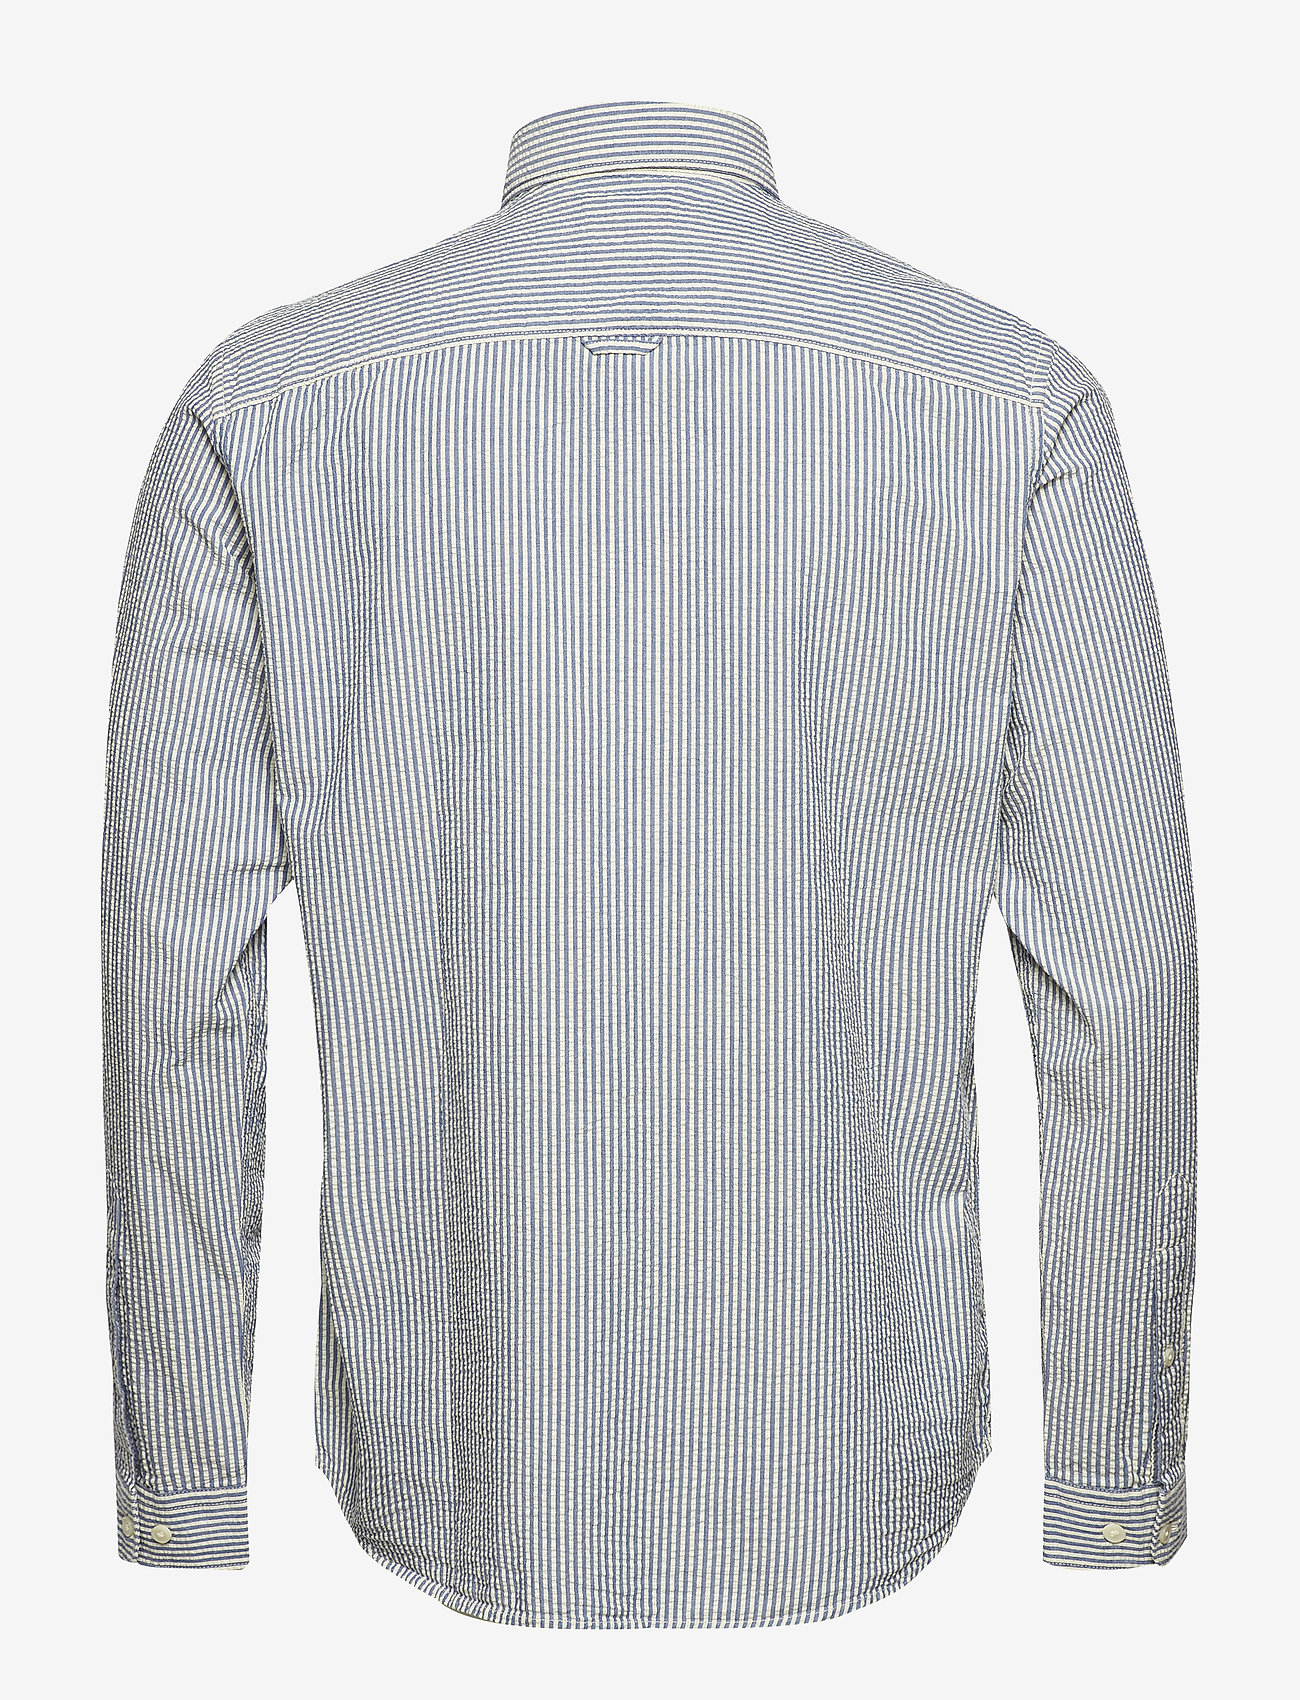 Selected Homme - SHHTWOOLIVER SHIRT LS SEERSUCKER - chemises business - blue aster